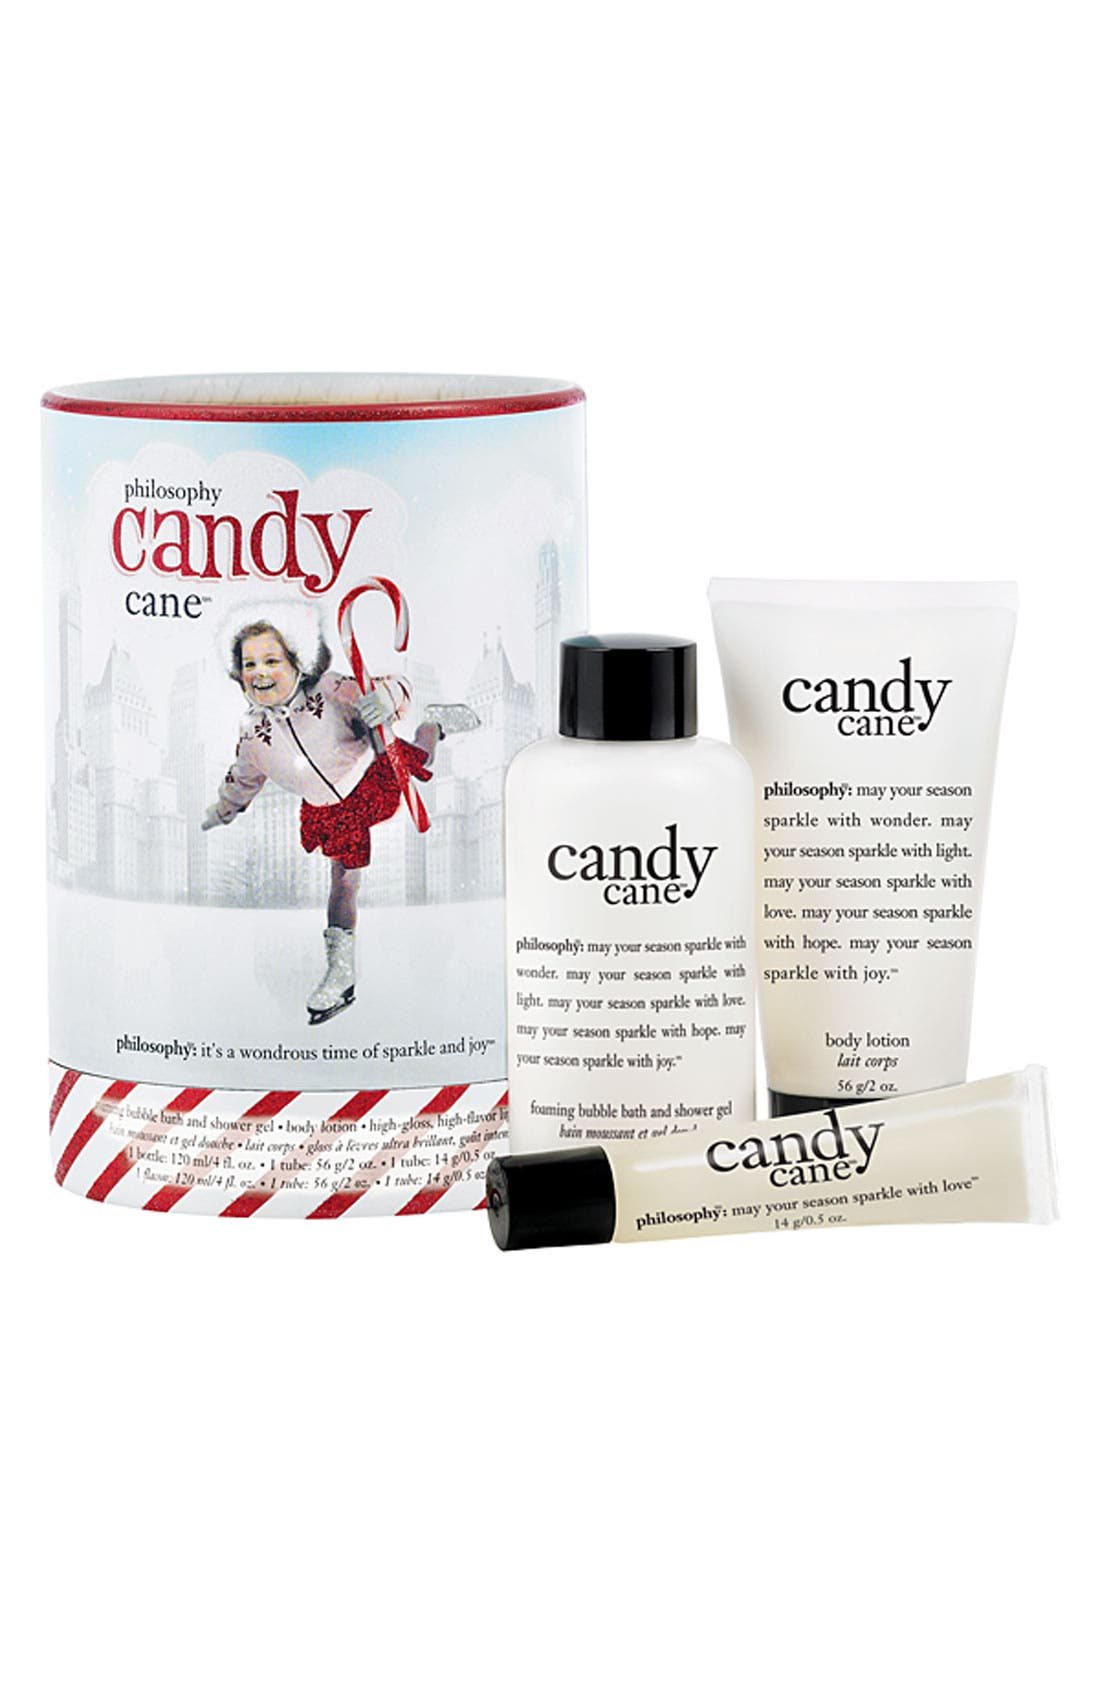 philosophy 'candy cane' gift set | Nordstrom